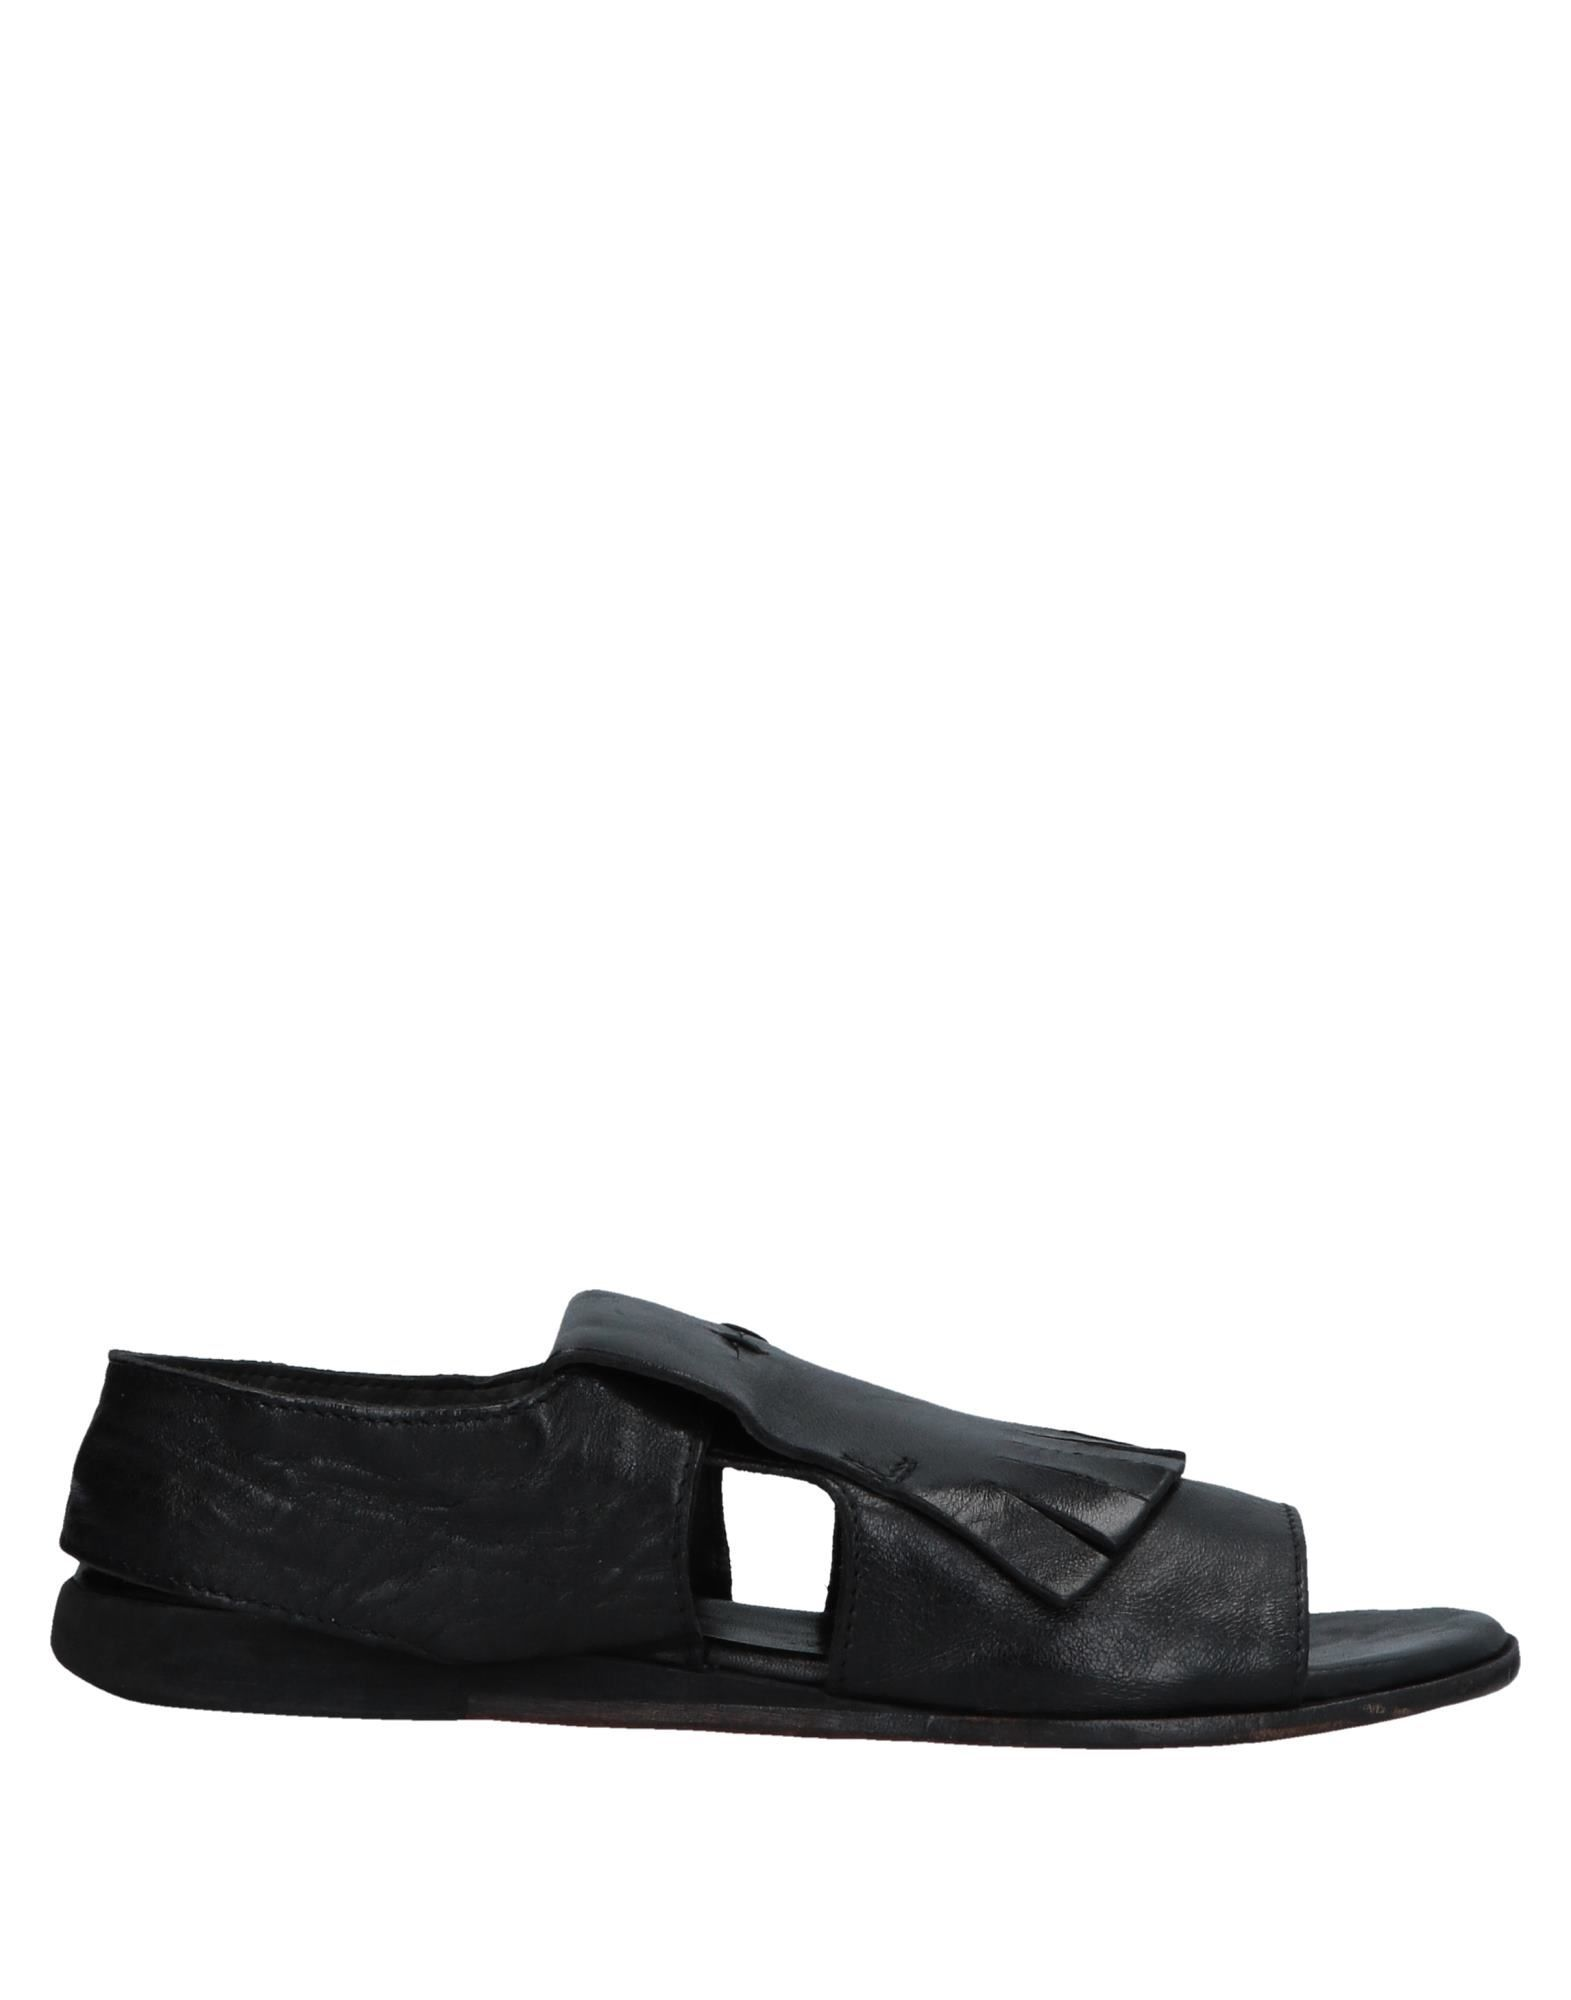 Moma Black Leather Sandals